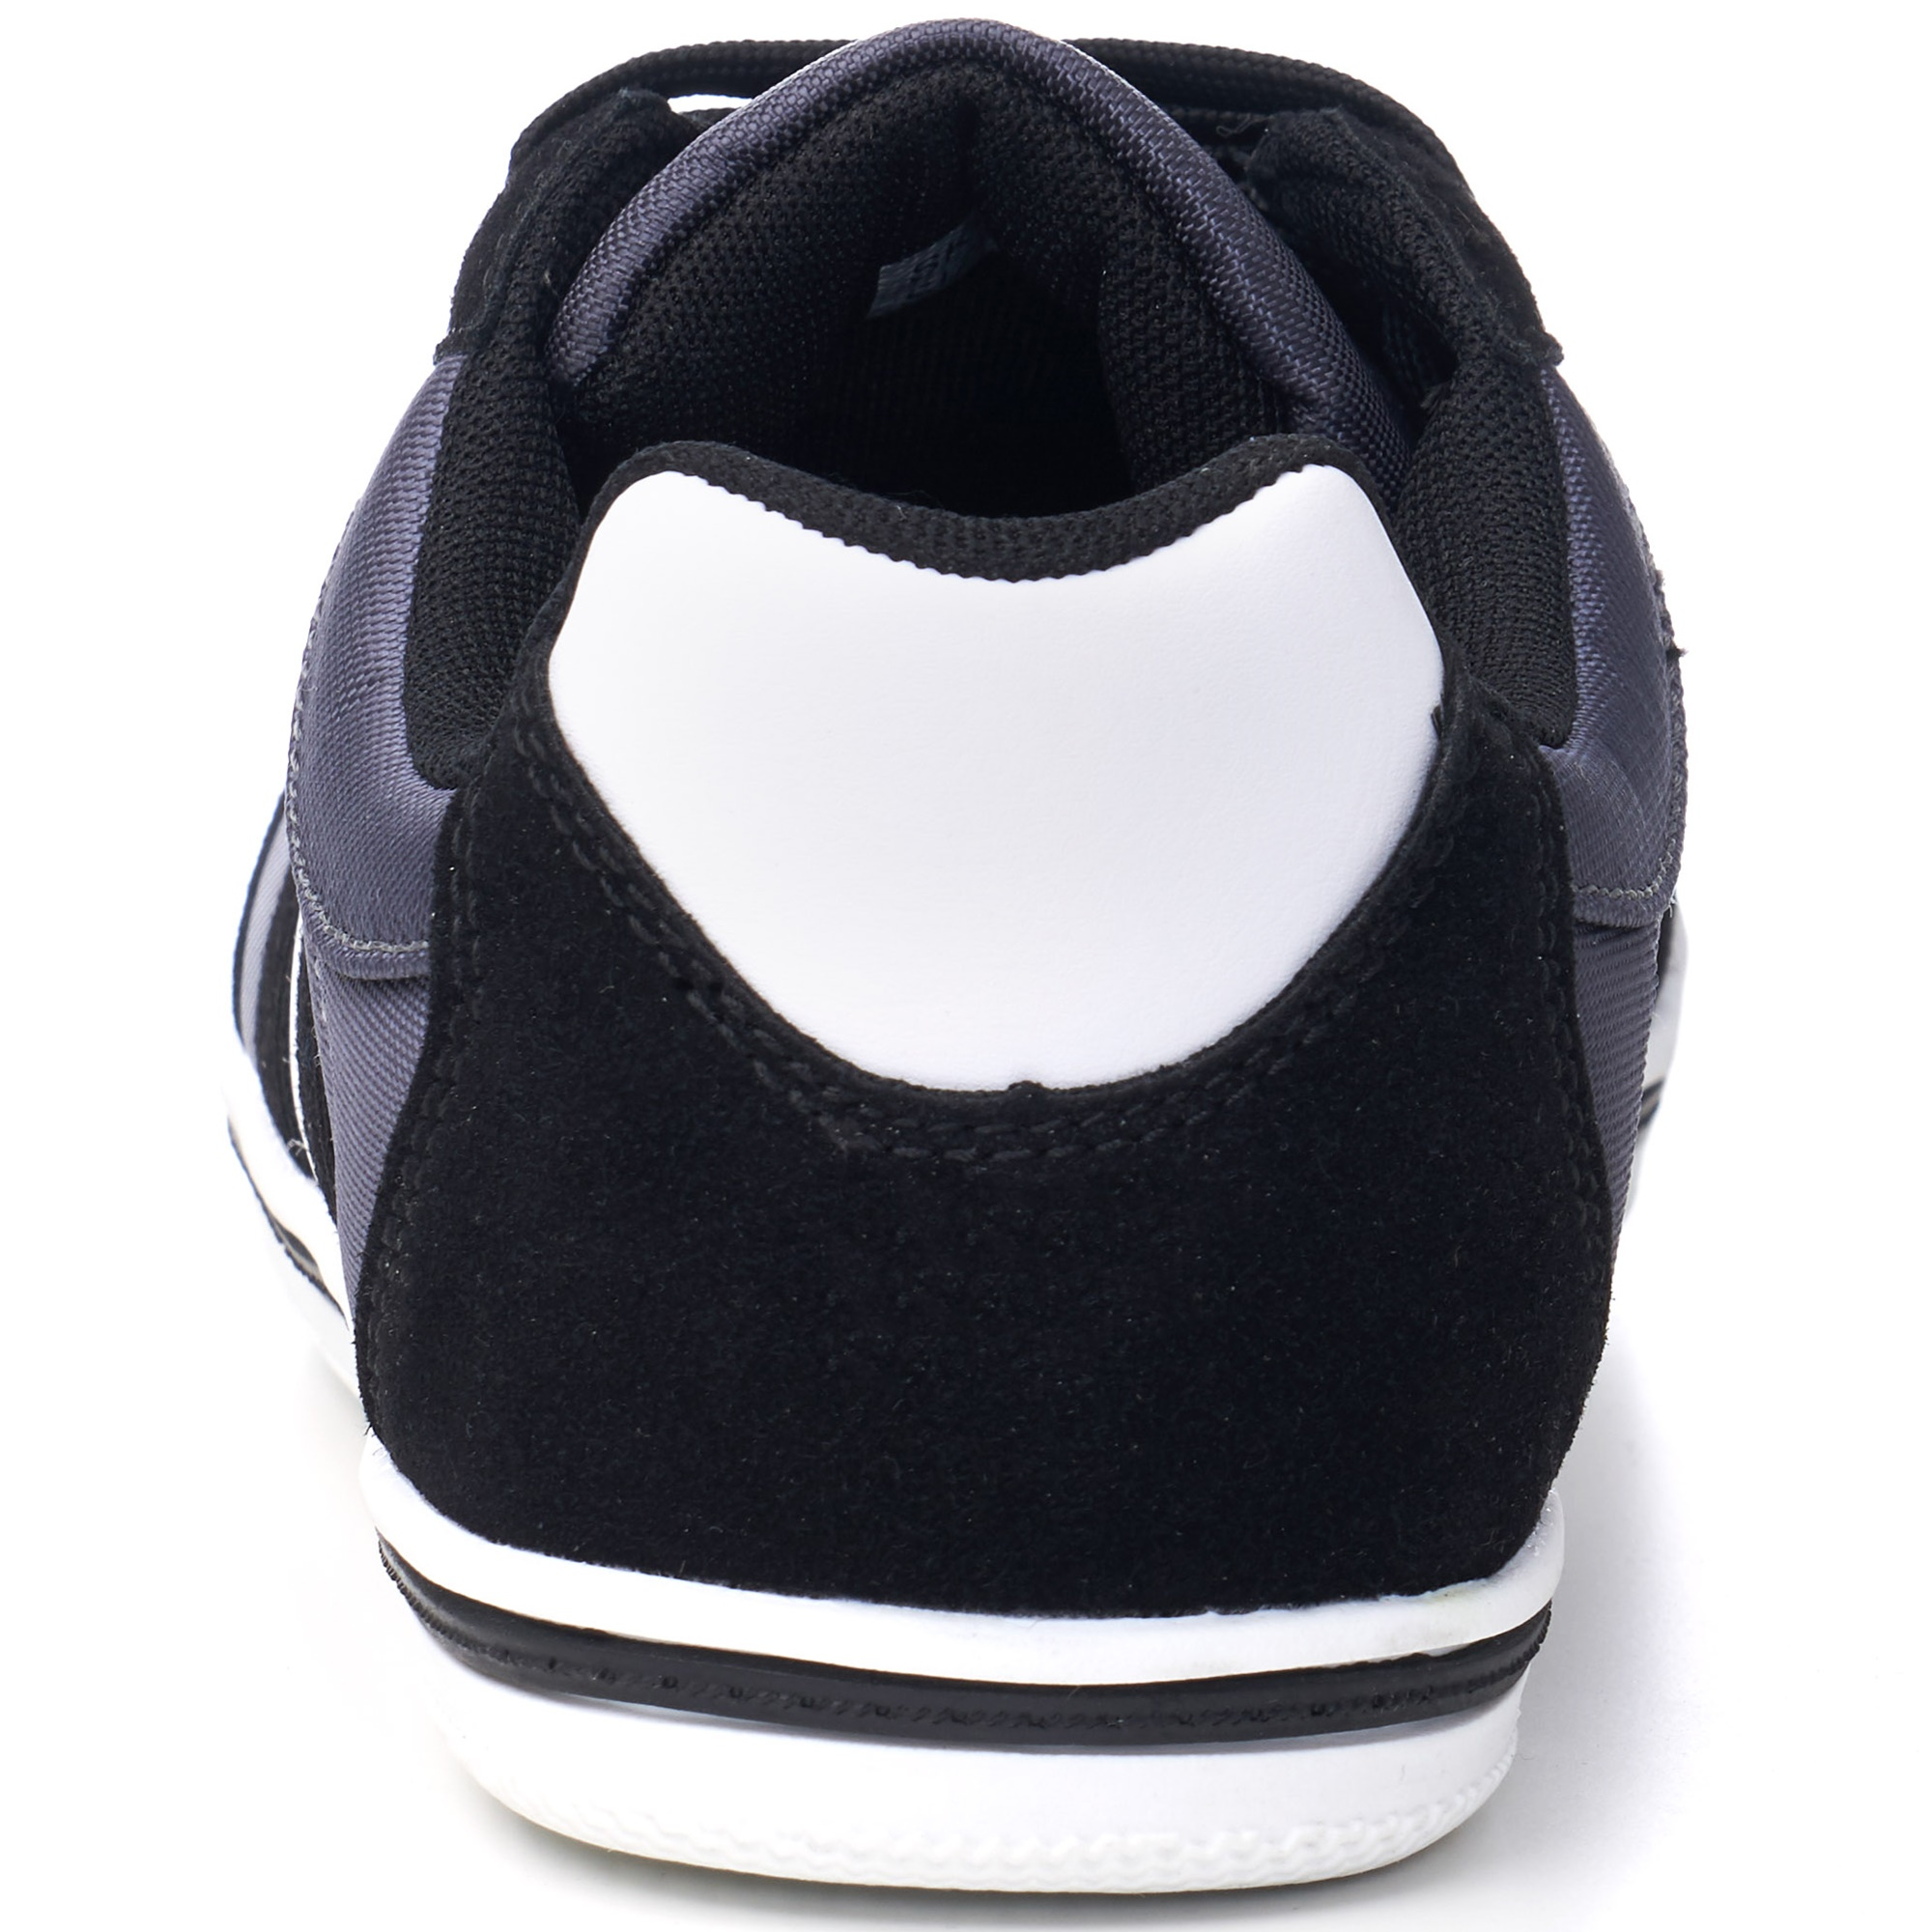 Alpine-Swiss-Haris-Mens-Retro-Striped-Athletic-Shoes-Fashion-Sneaker-Tennis-Shoe thumbnail 8